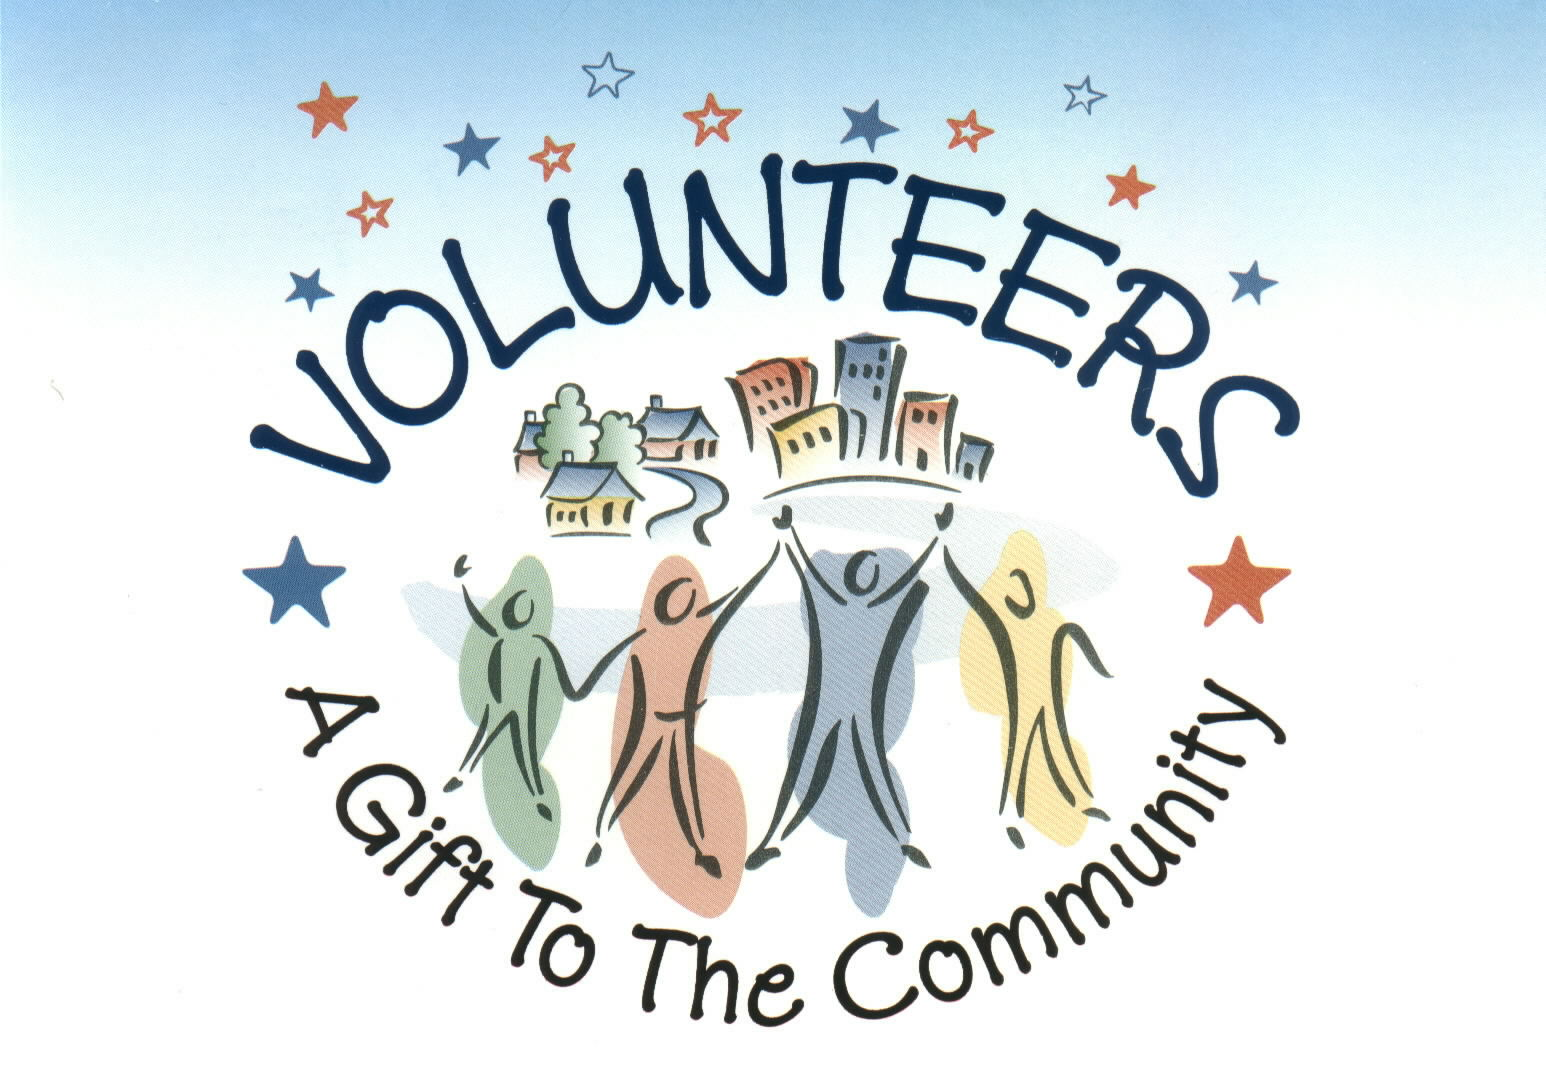 Free volunteer orientation cliparts. Volunteering clipart volunteerism